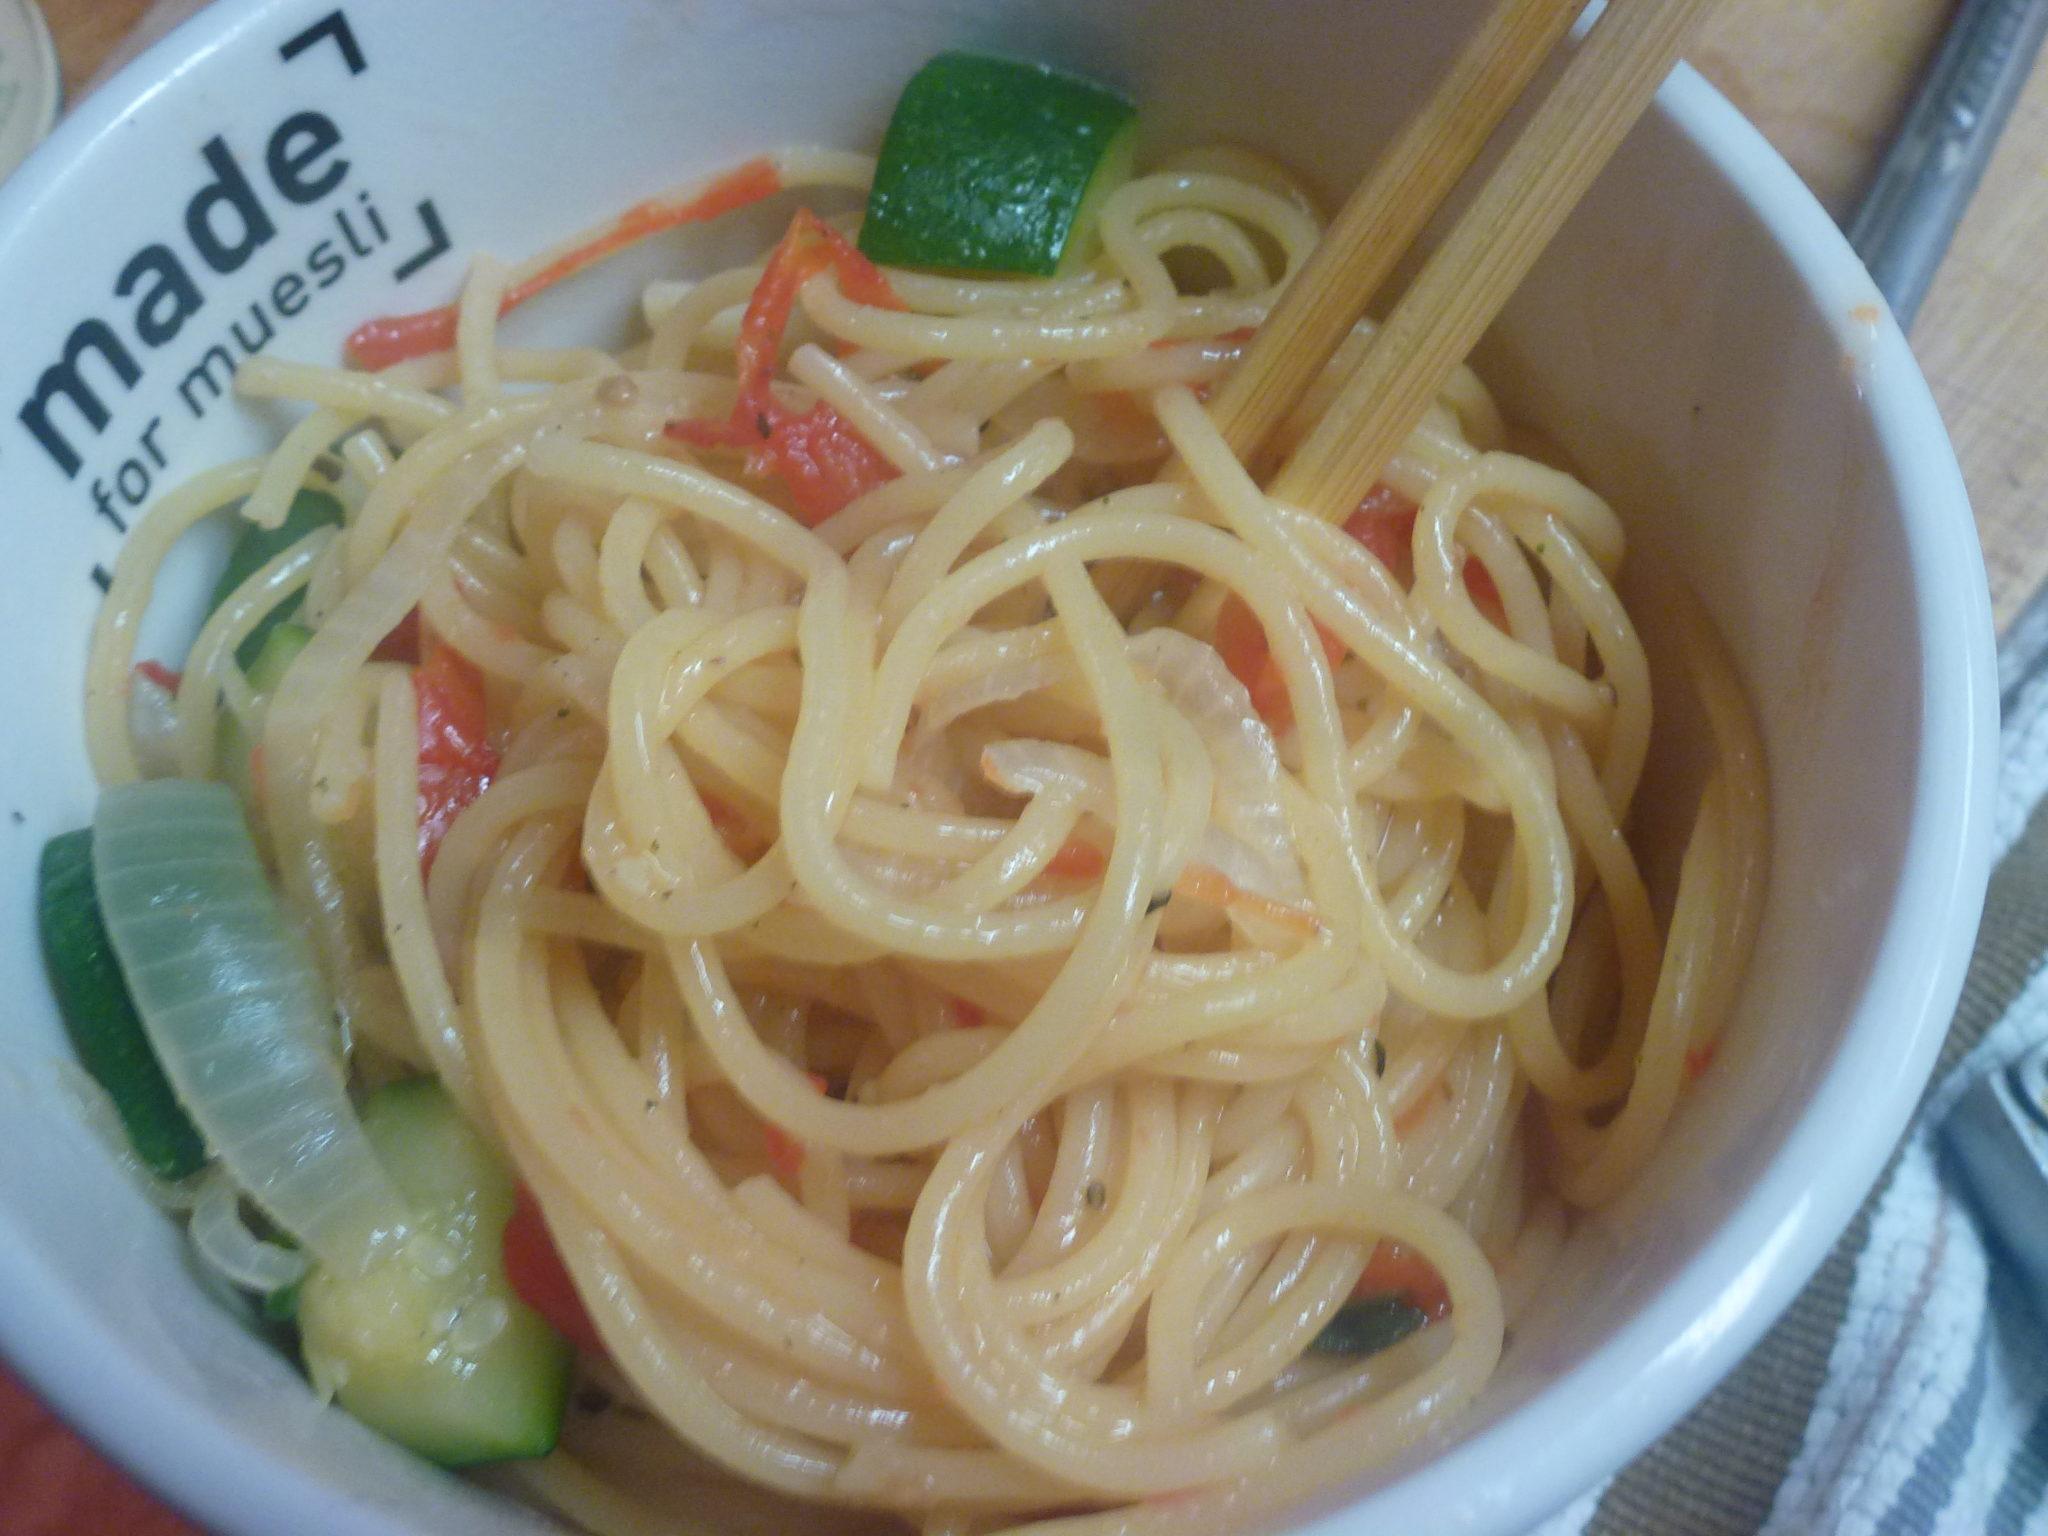 finished one-pot spaghetti